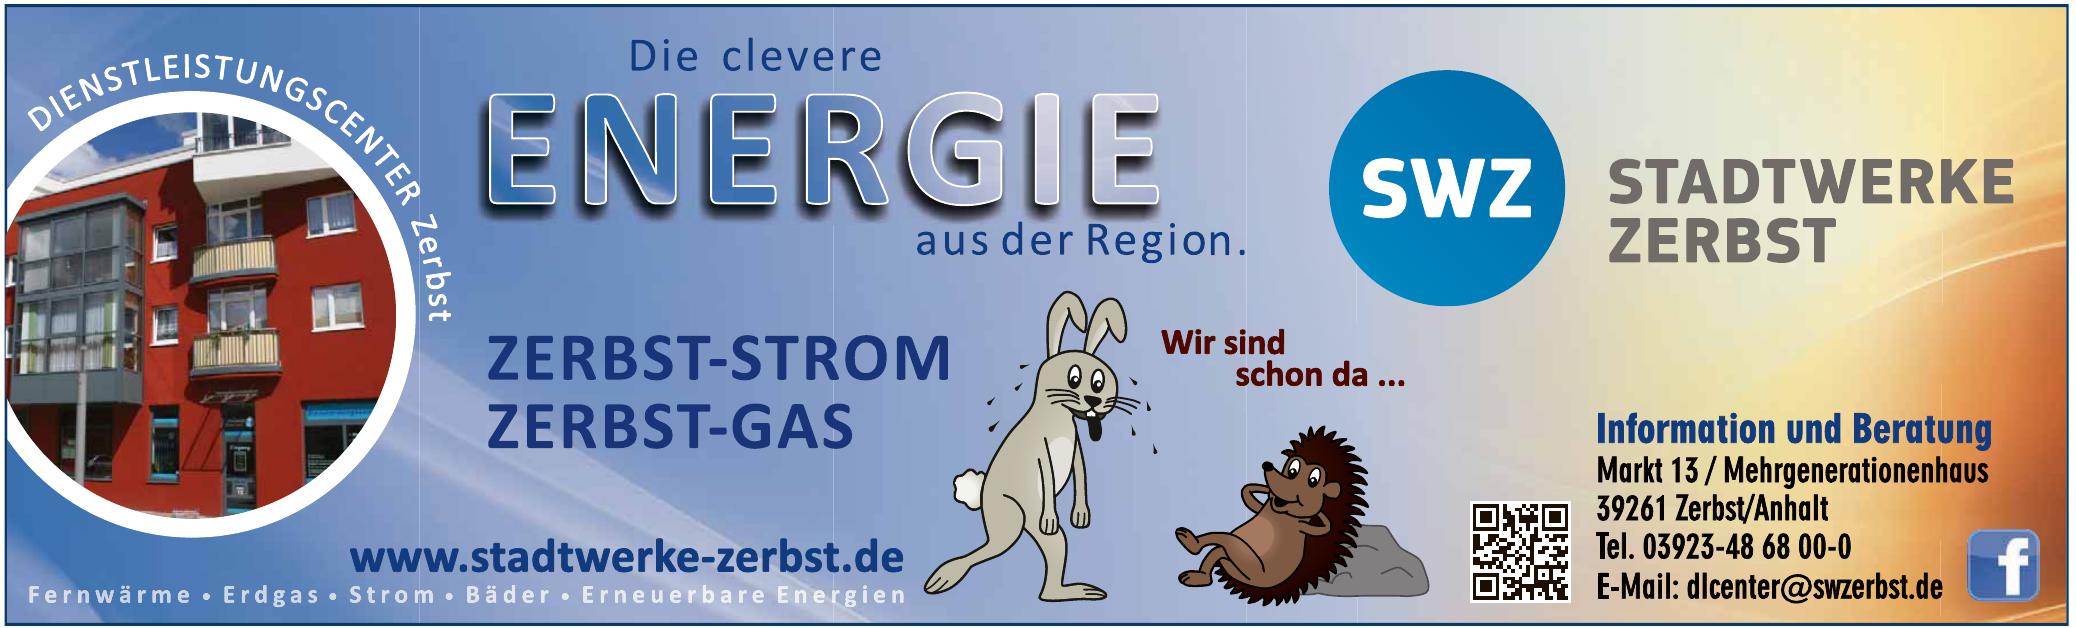 Stadtwerke Zerbst GmbH